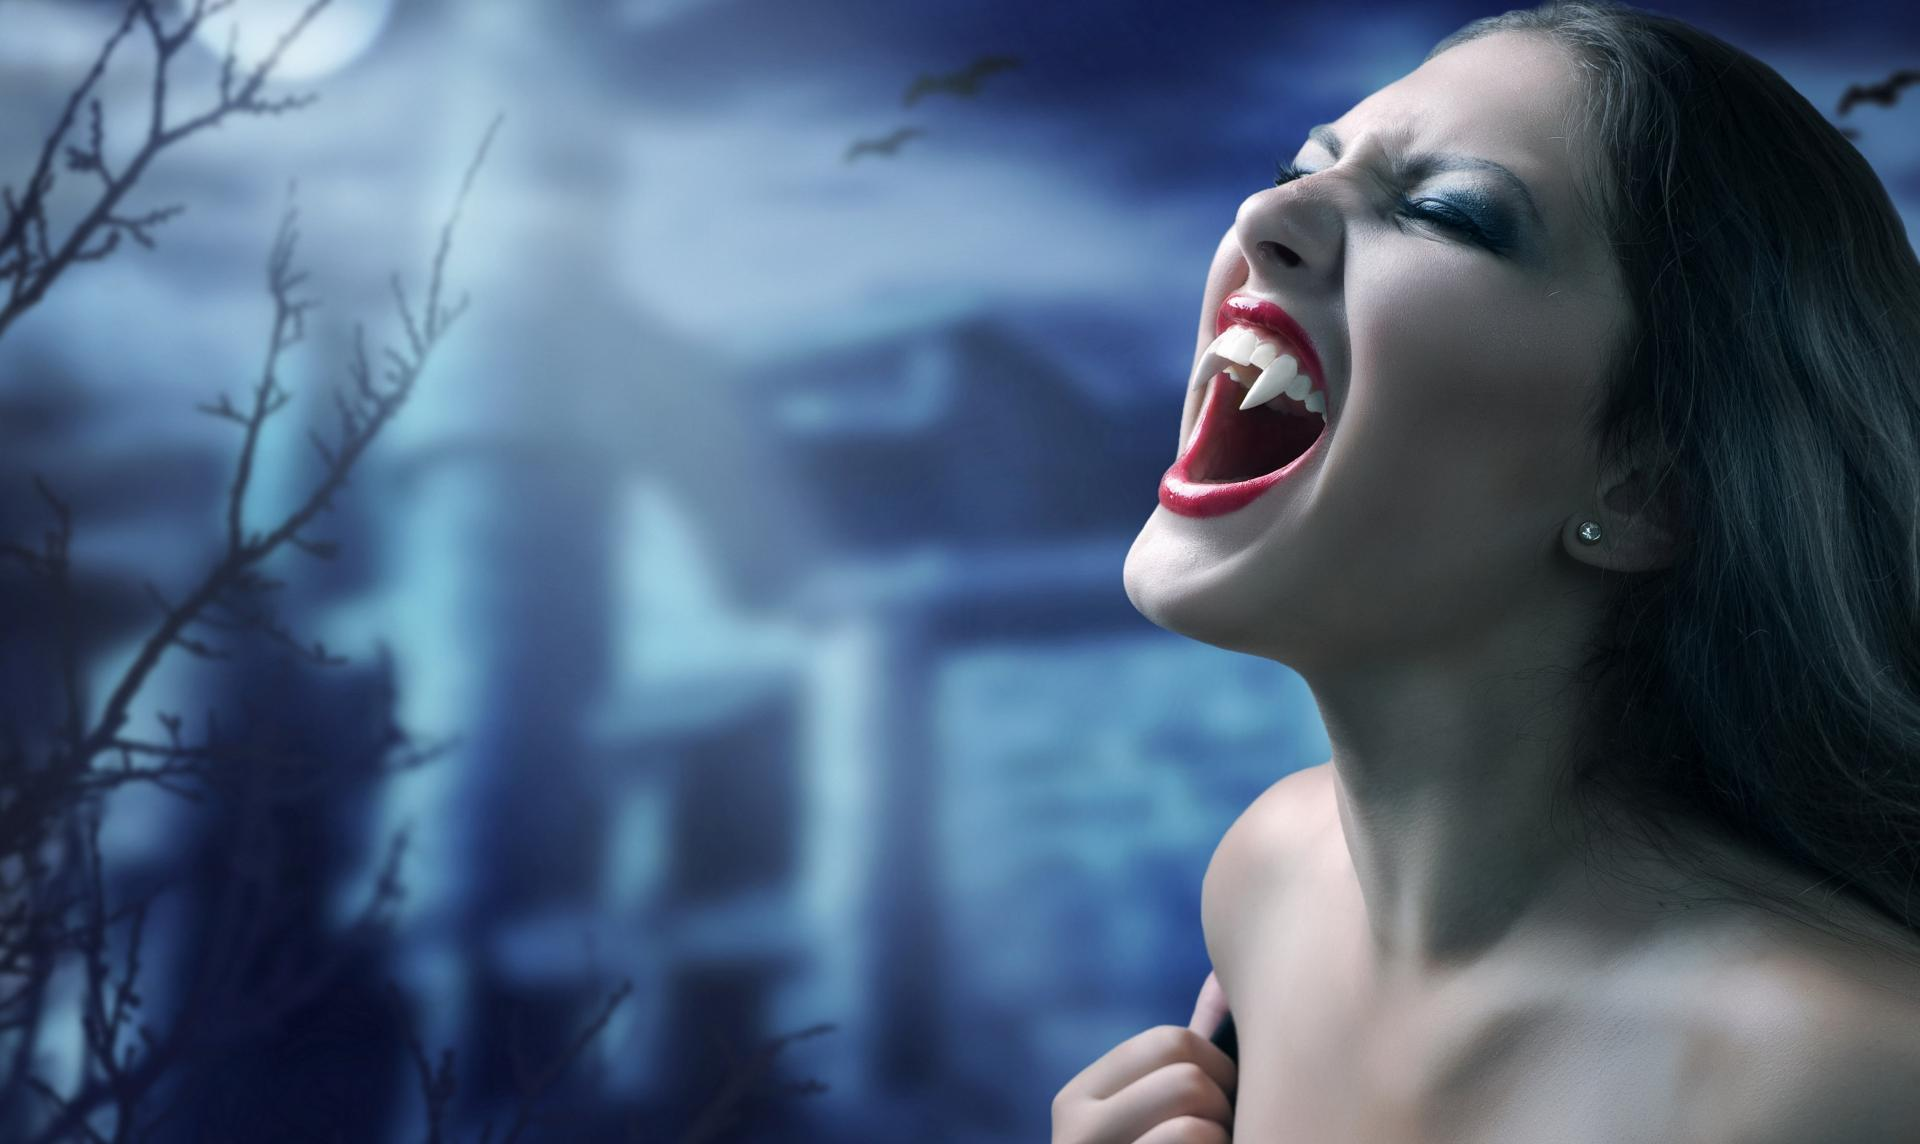 Секс фильмы с женщины вампиры